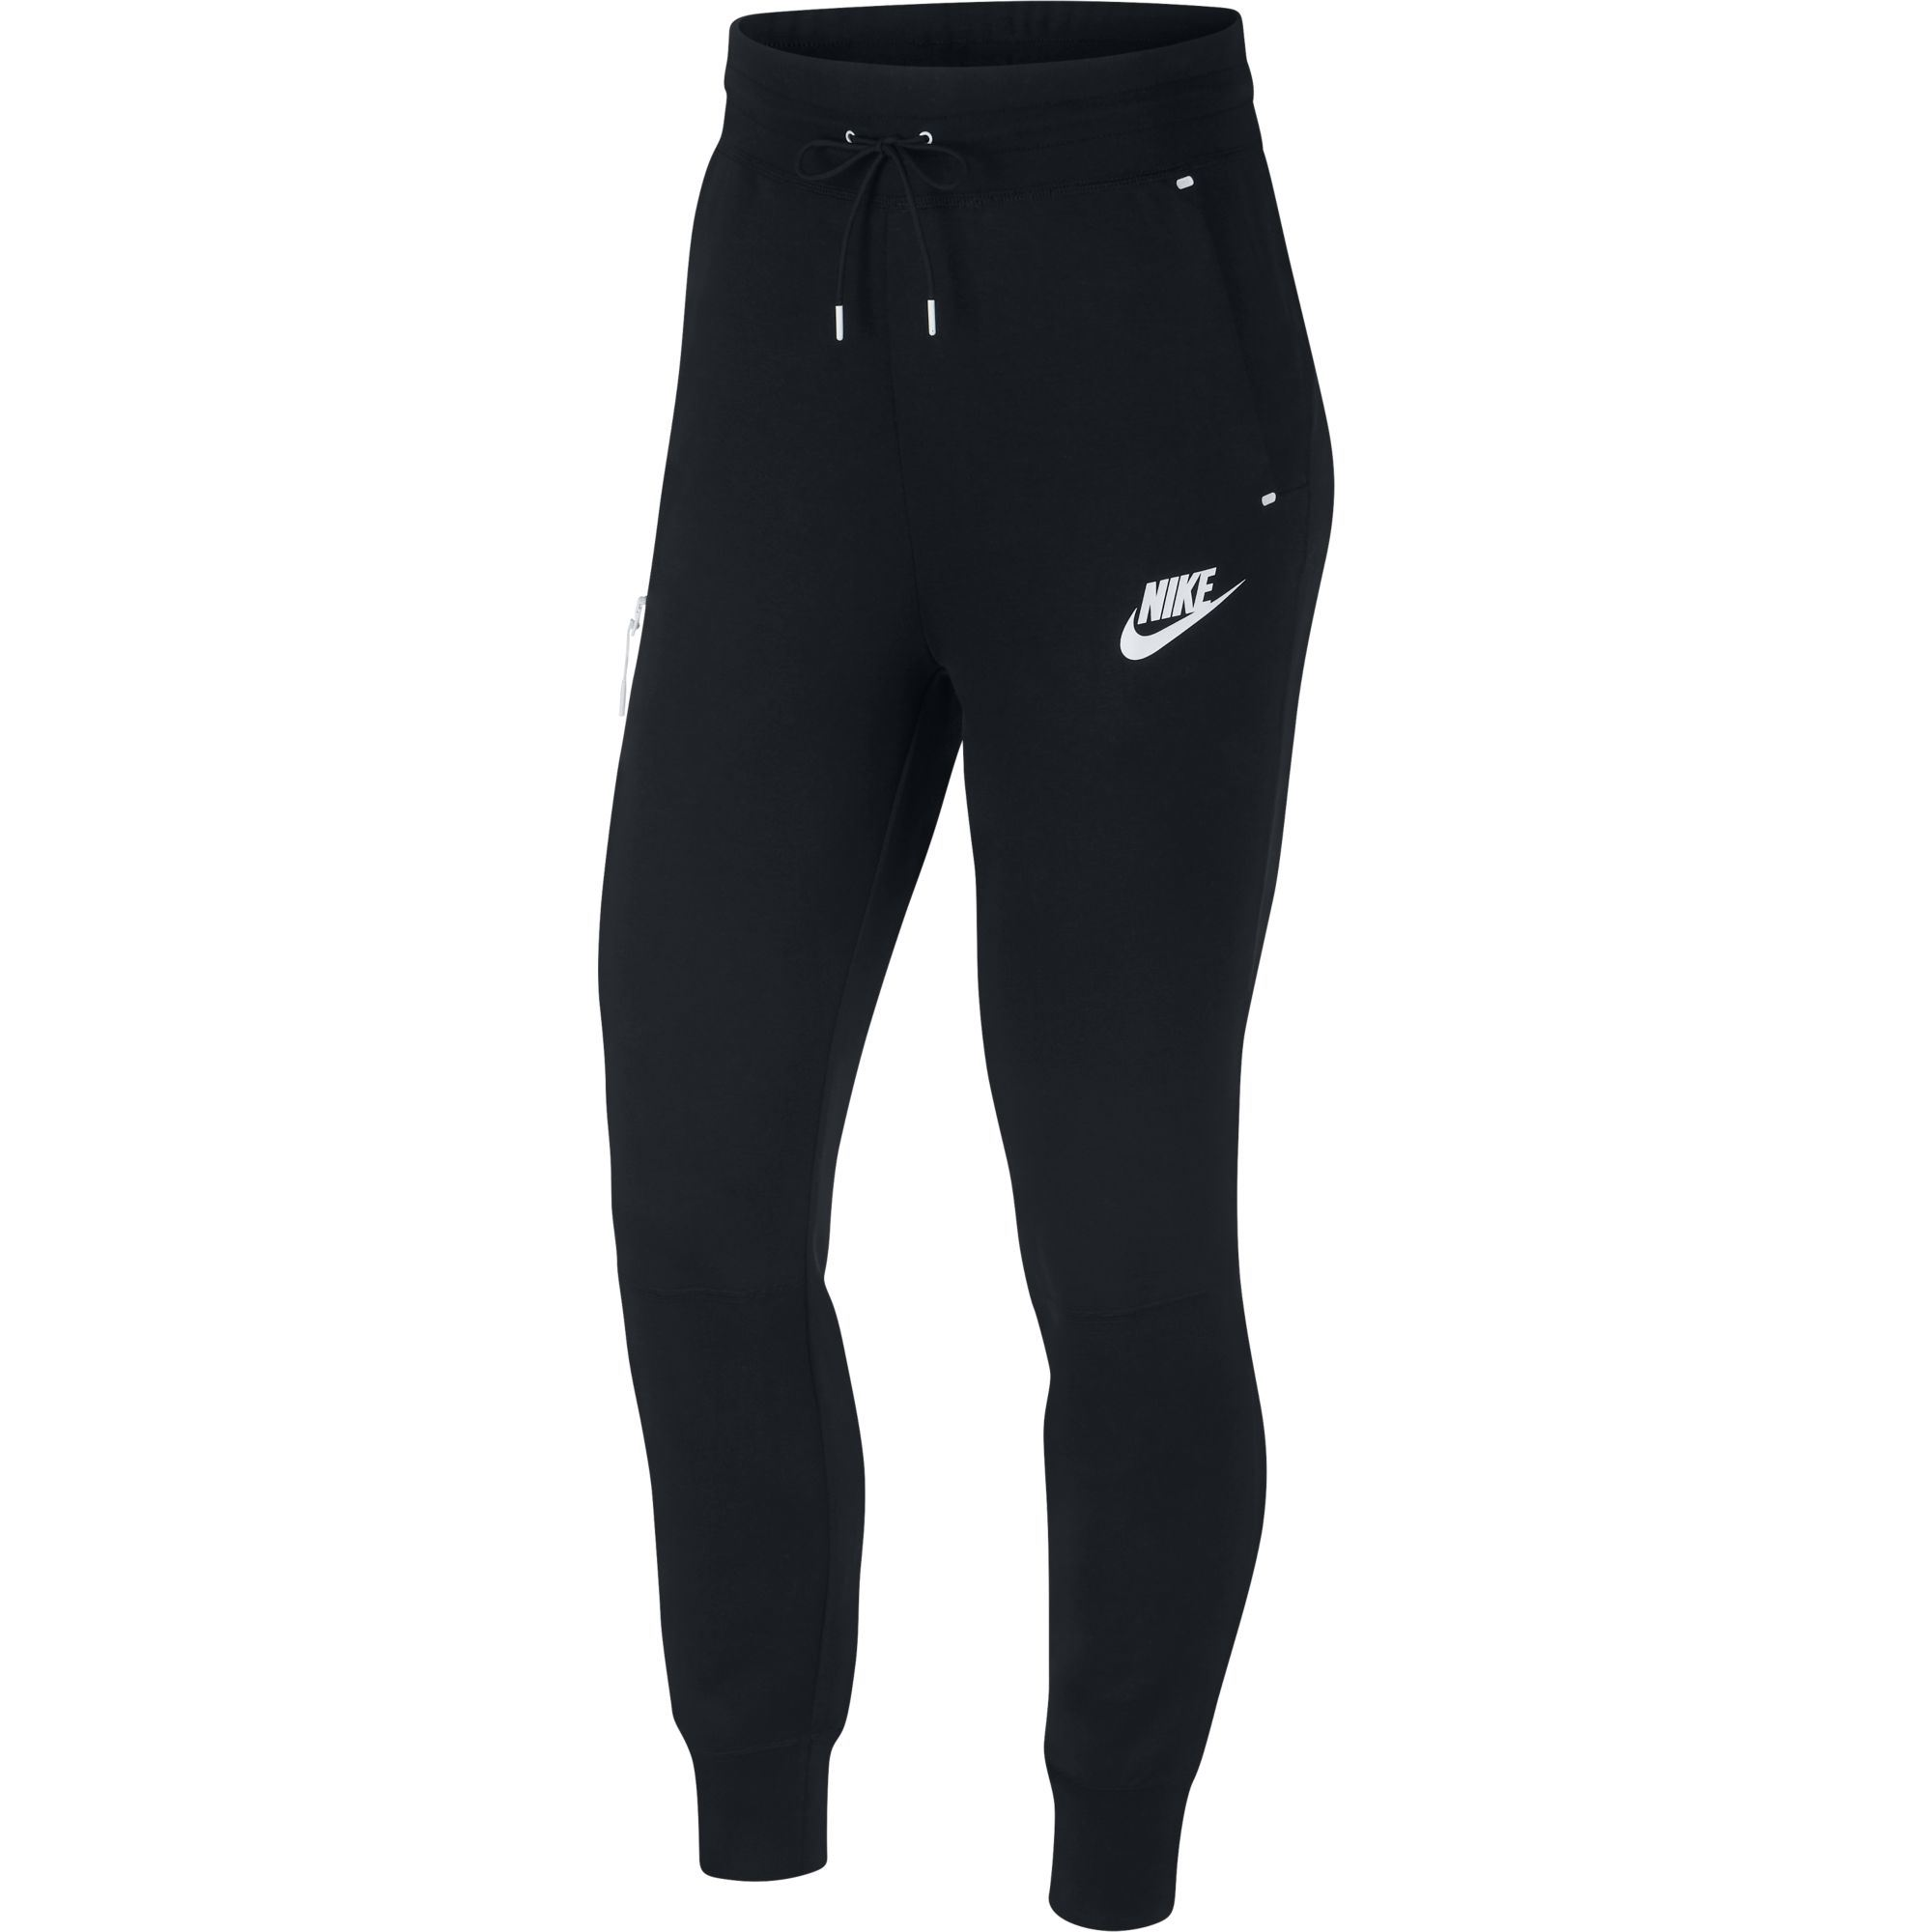 Pantalones Nike Chica 55 Descuento Gigarobot Net